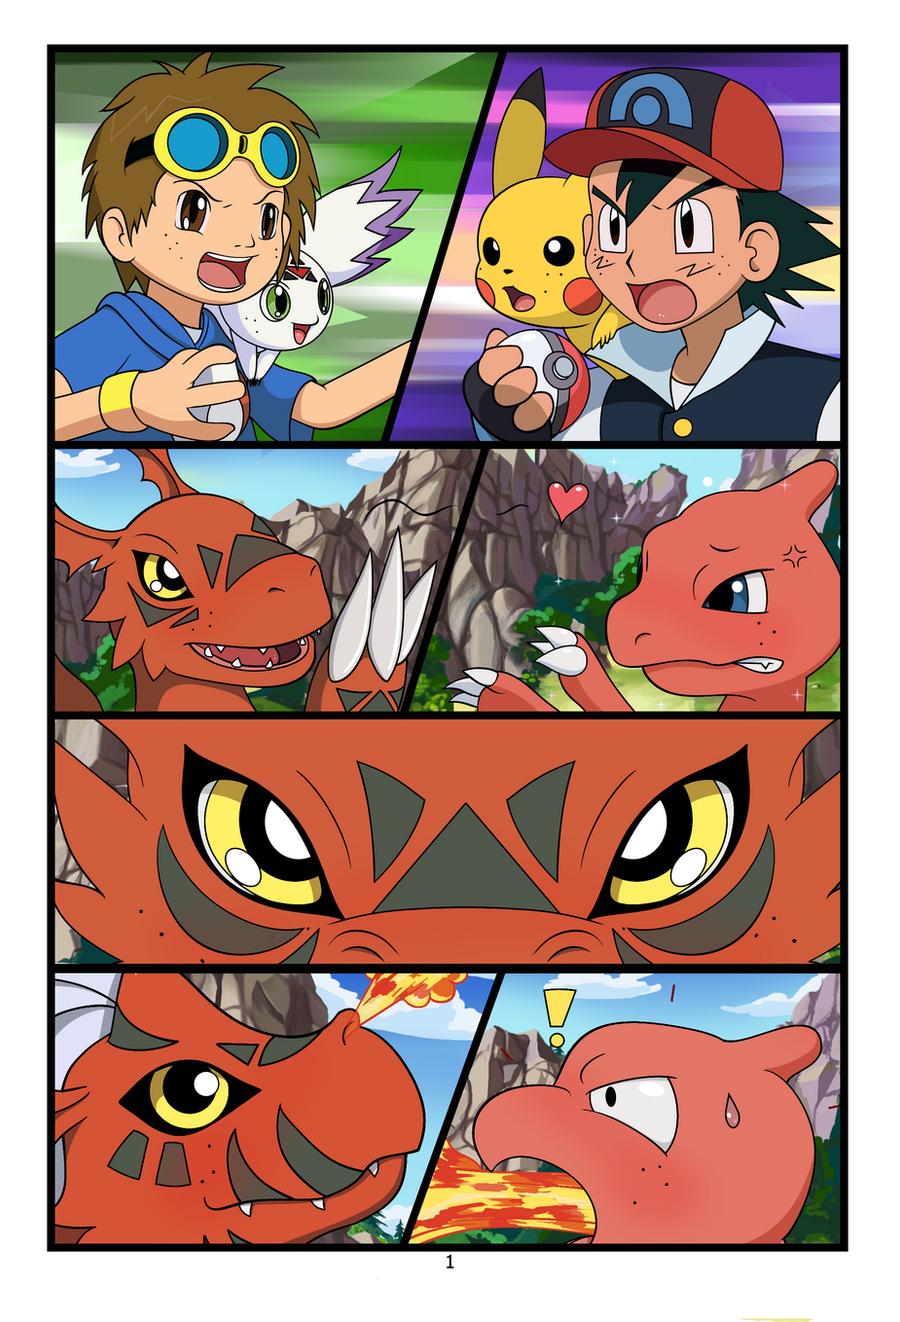 Adult Digimon und Pokemon Art